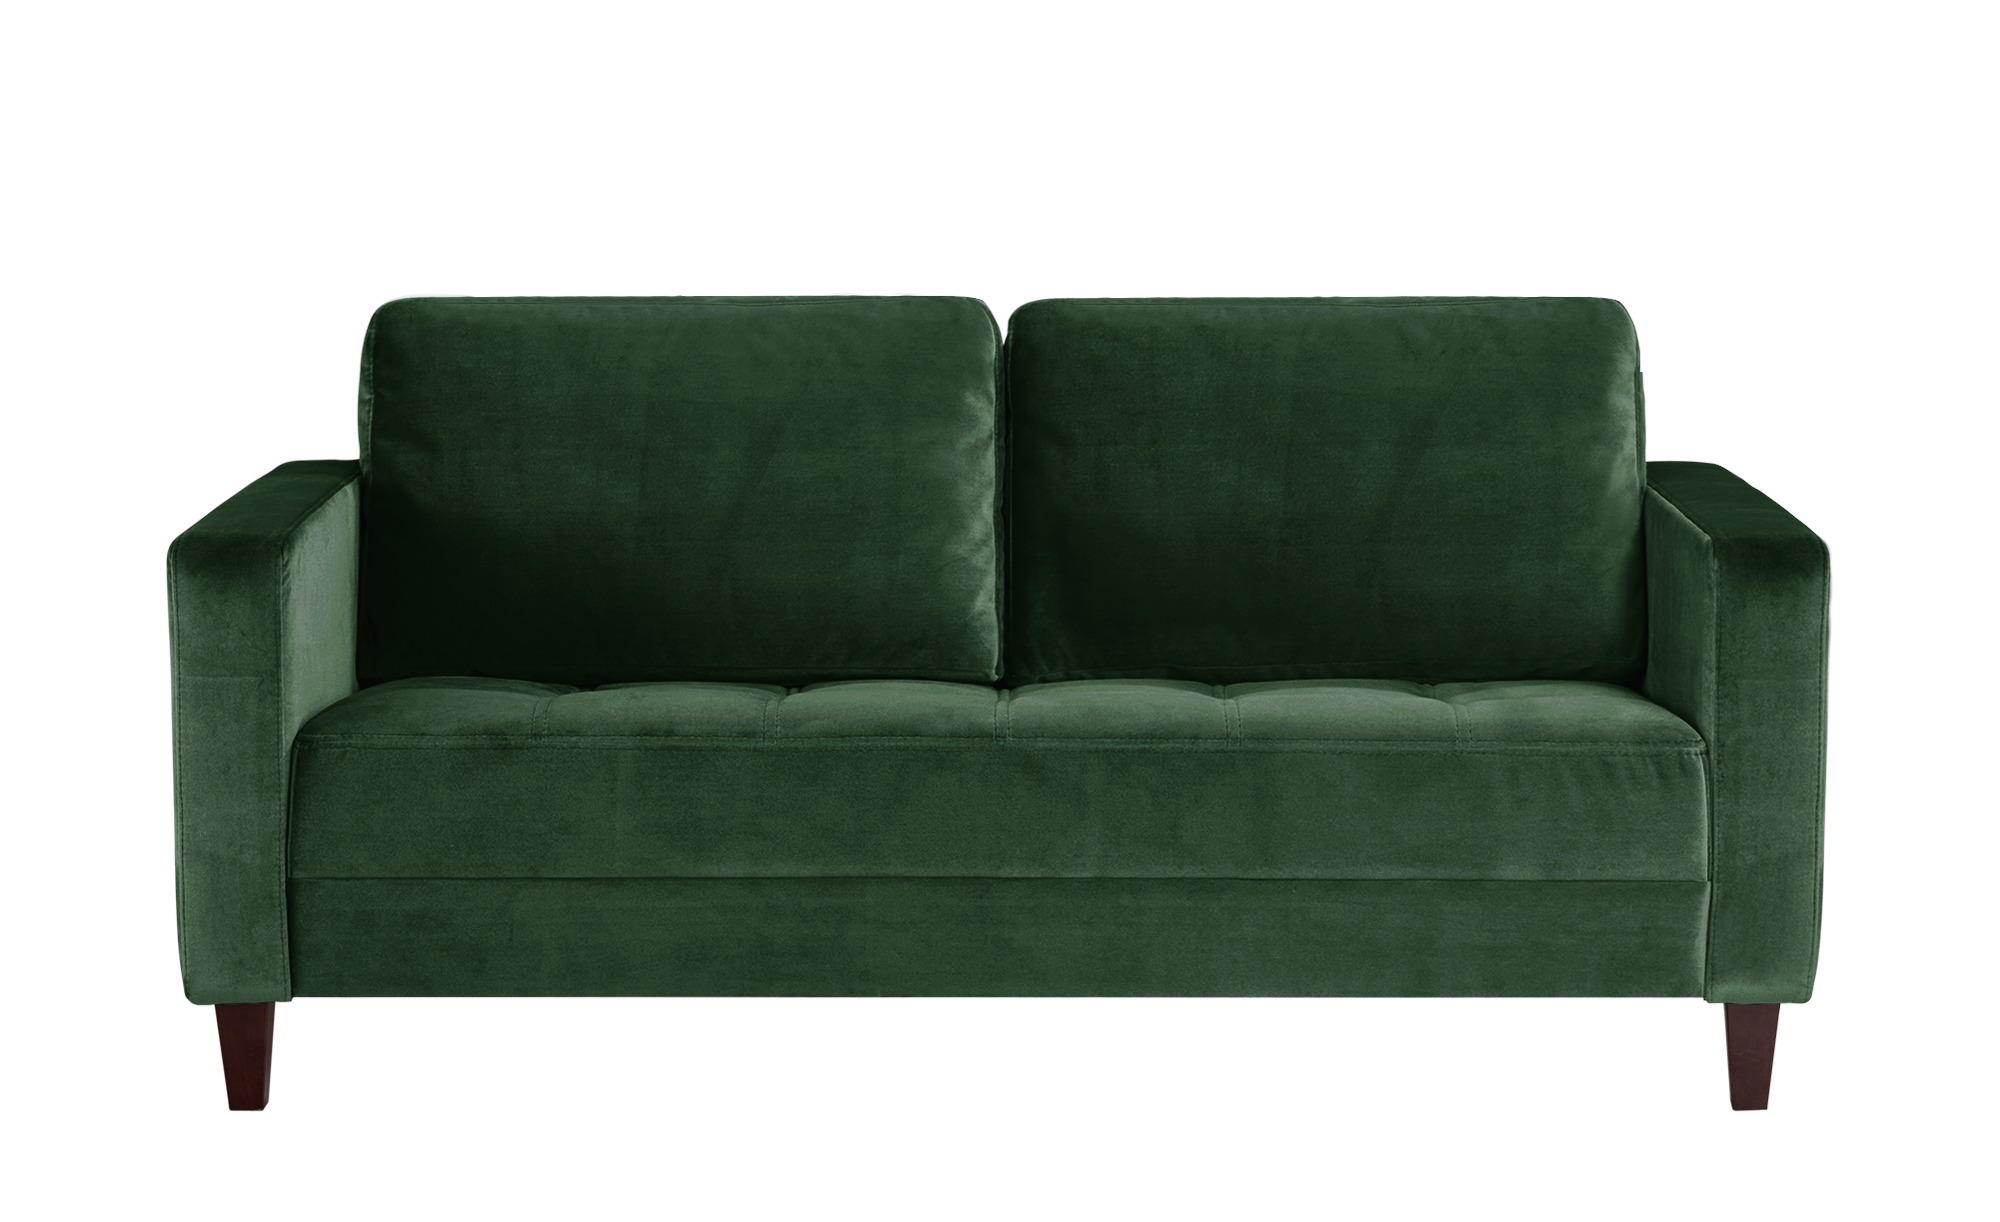 smart Sofa Geradine Breite 177 cm Höhe 93 cm grün online